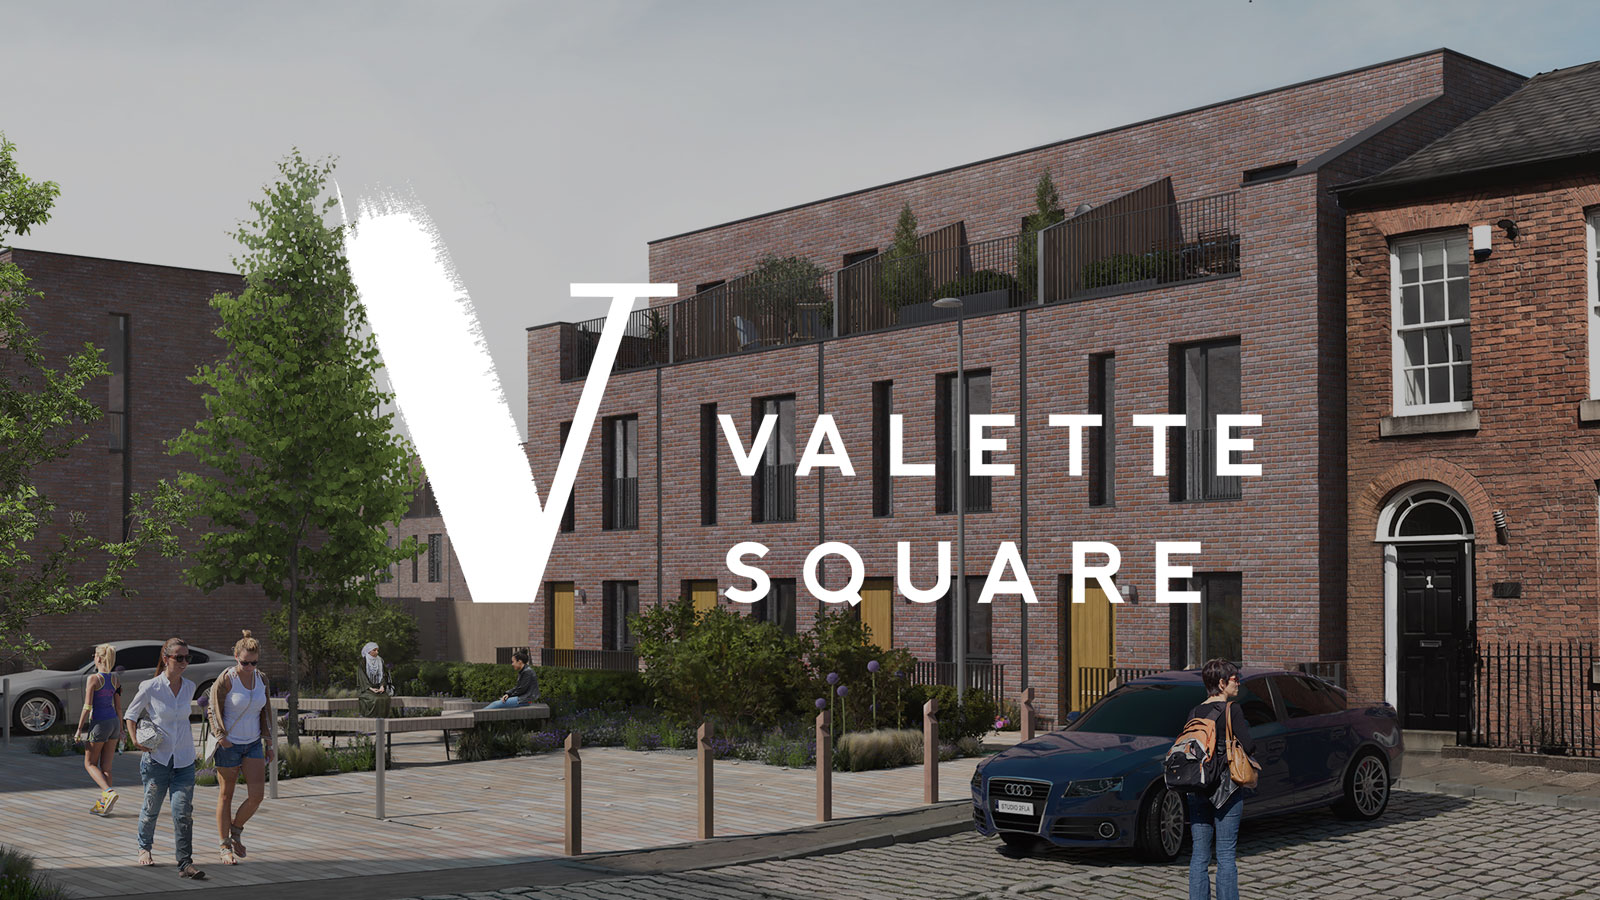 Valette Square